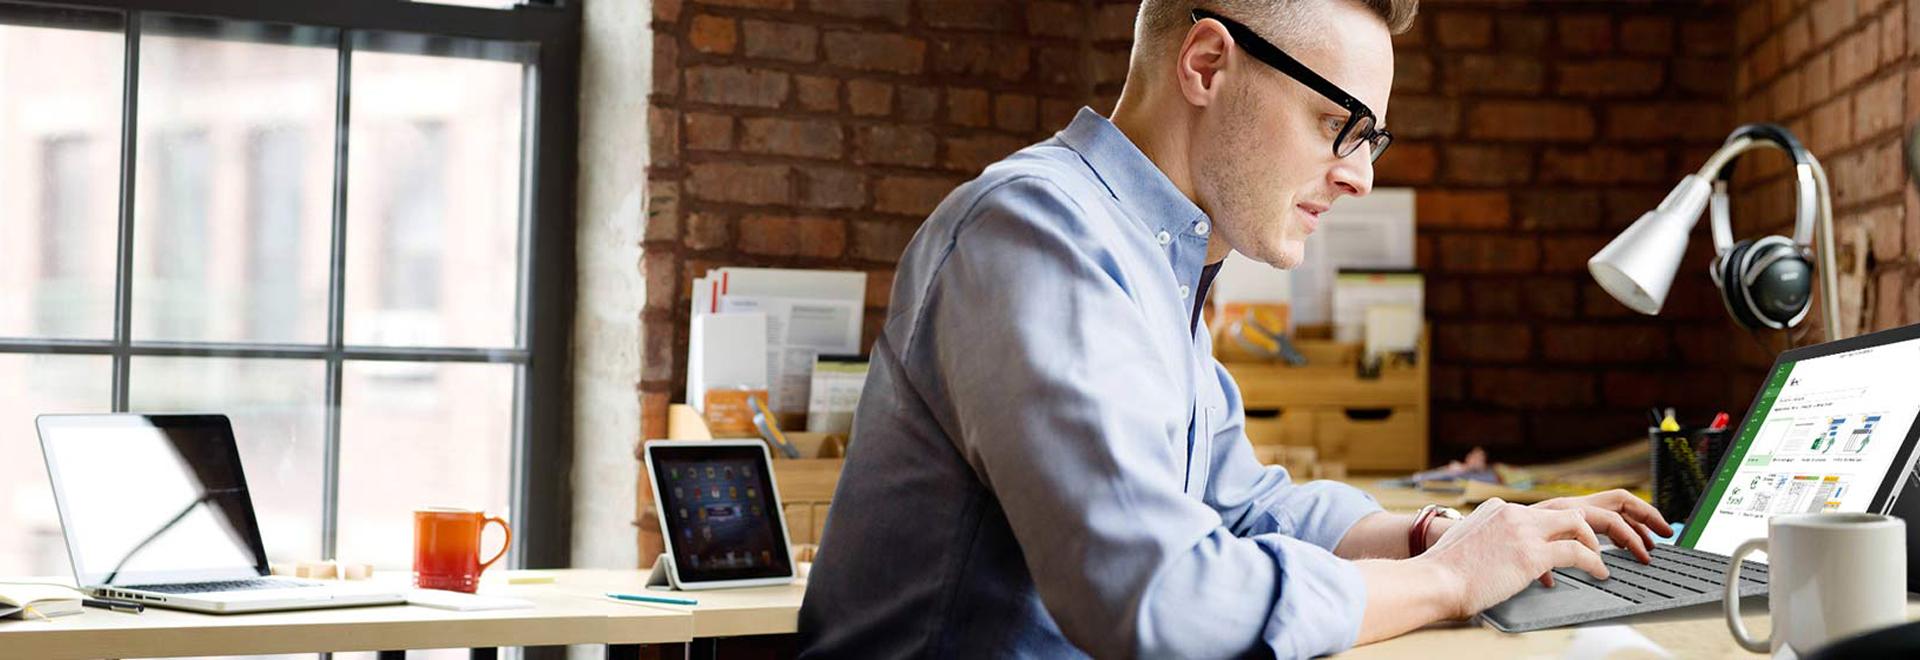 Seorang pria duduk di meja dan bekerja pada tablet Surface, menggunakan Microsoft Project.